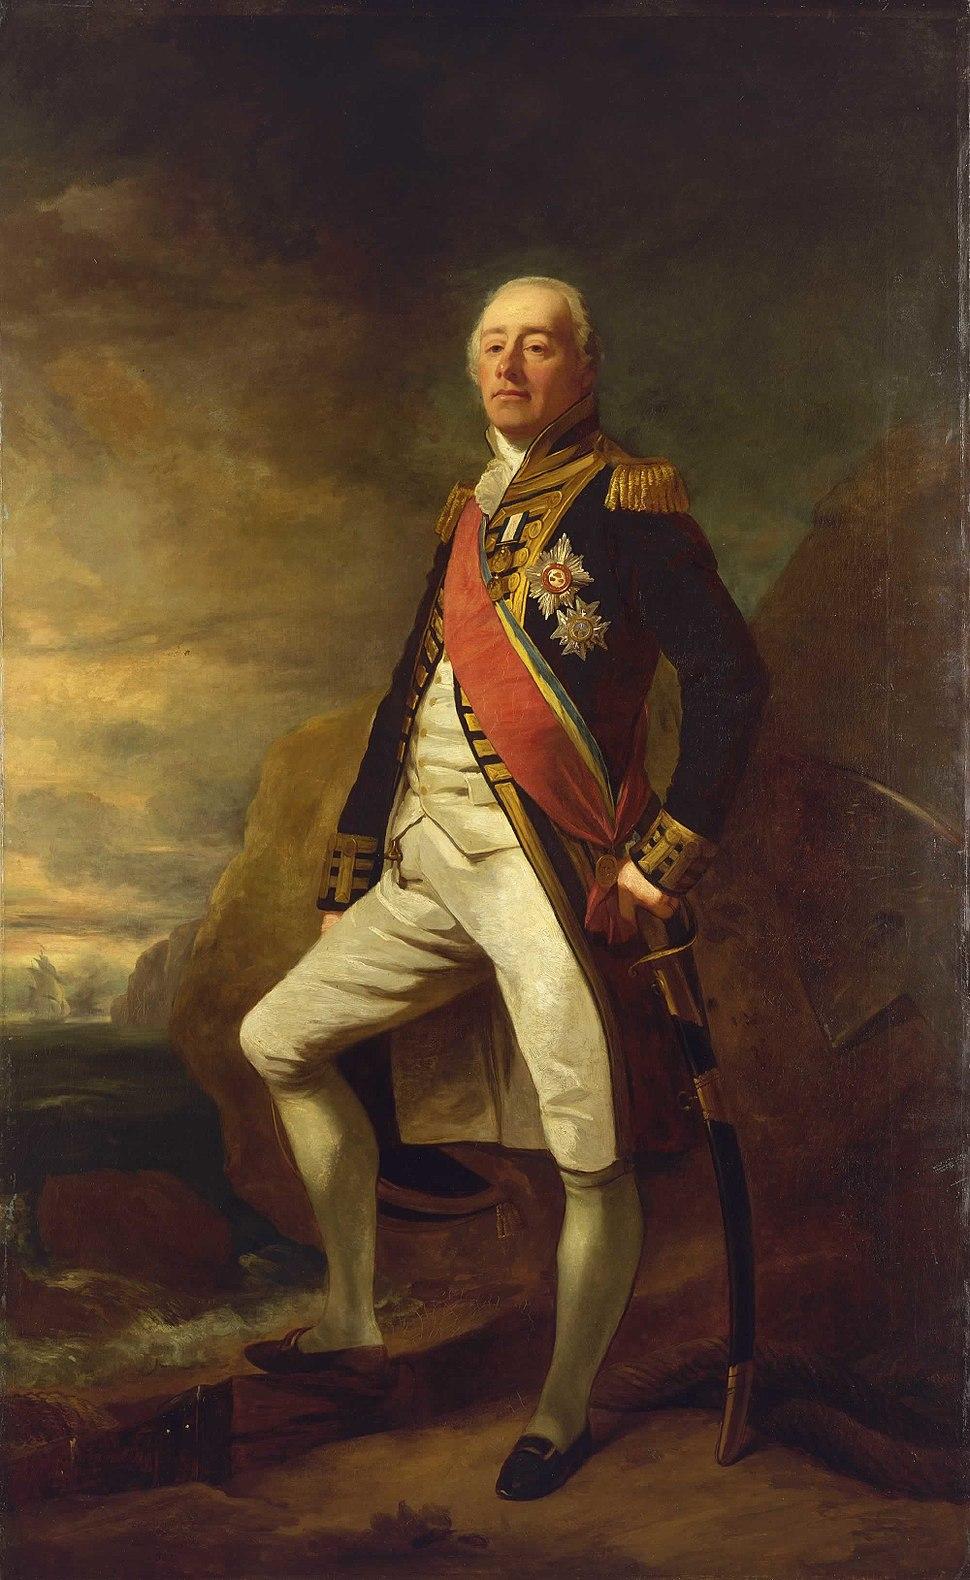 Vice-Admiral James Saumarez